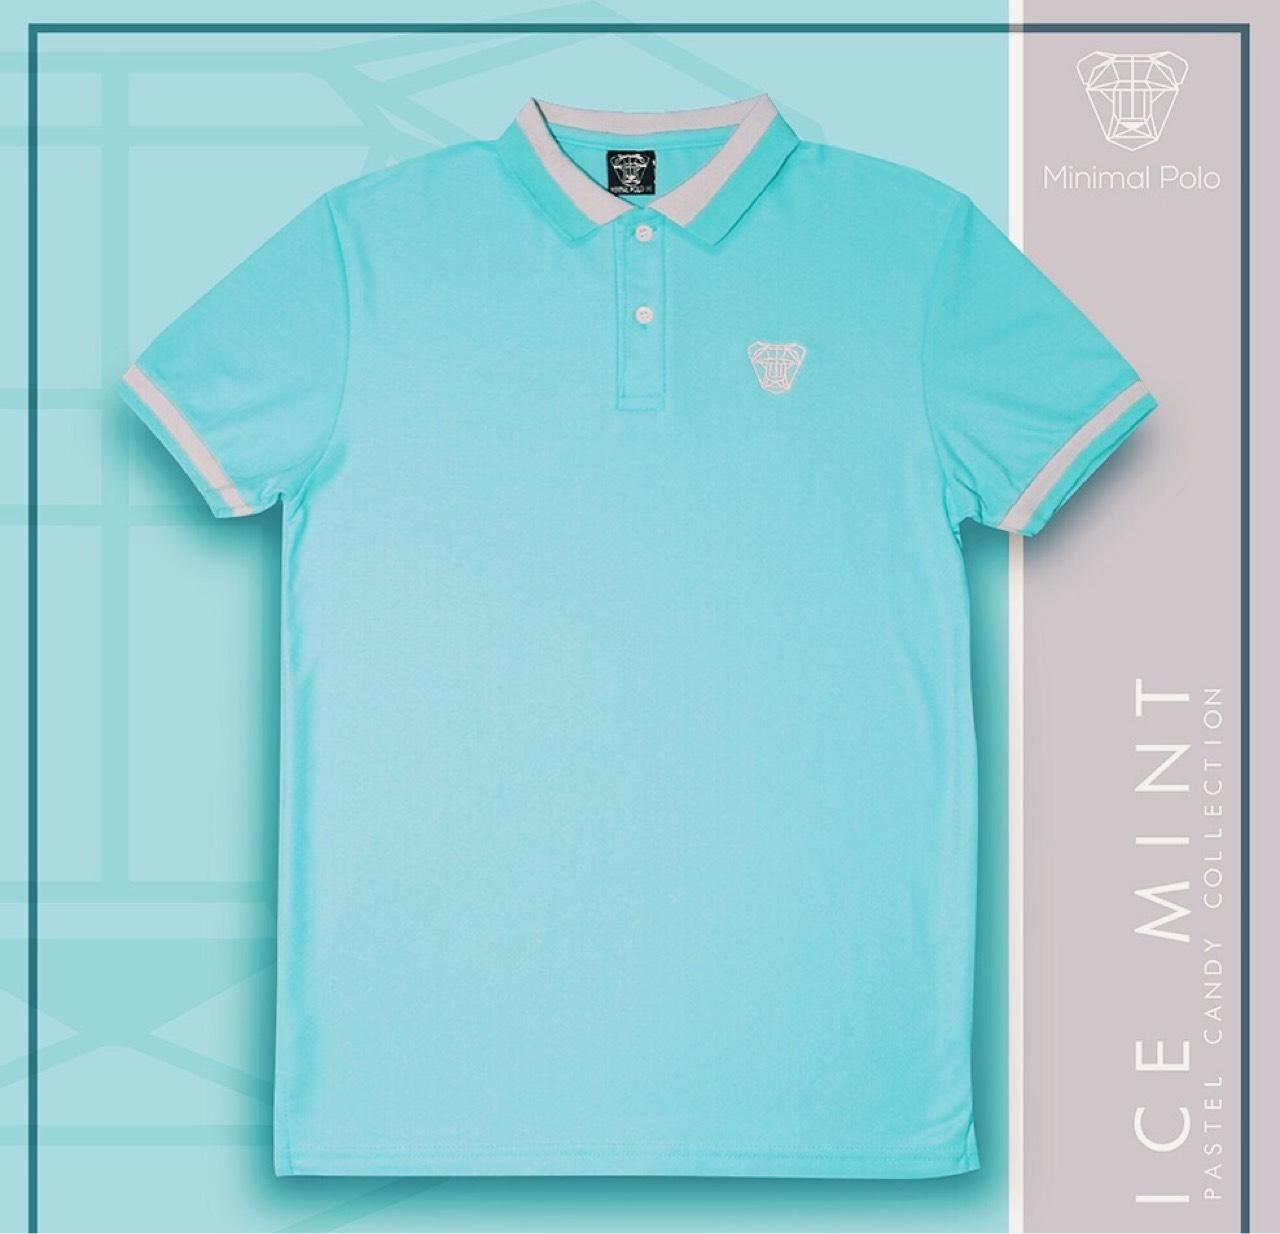 polo,poloshirt,minimal,minimalstyle,minimalpolo,เสื้อคู่,เสื้อโปโล,โปโล,Minimalpolo